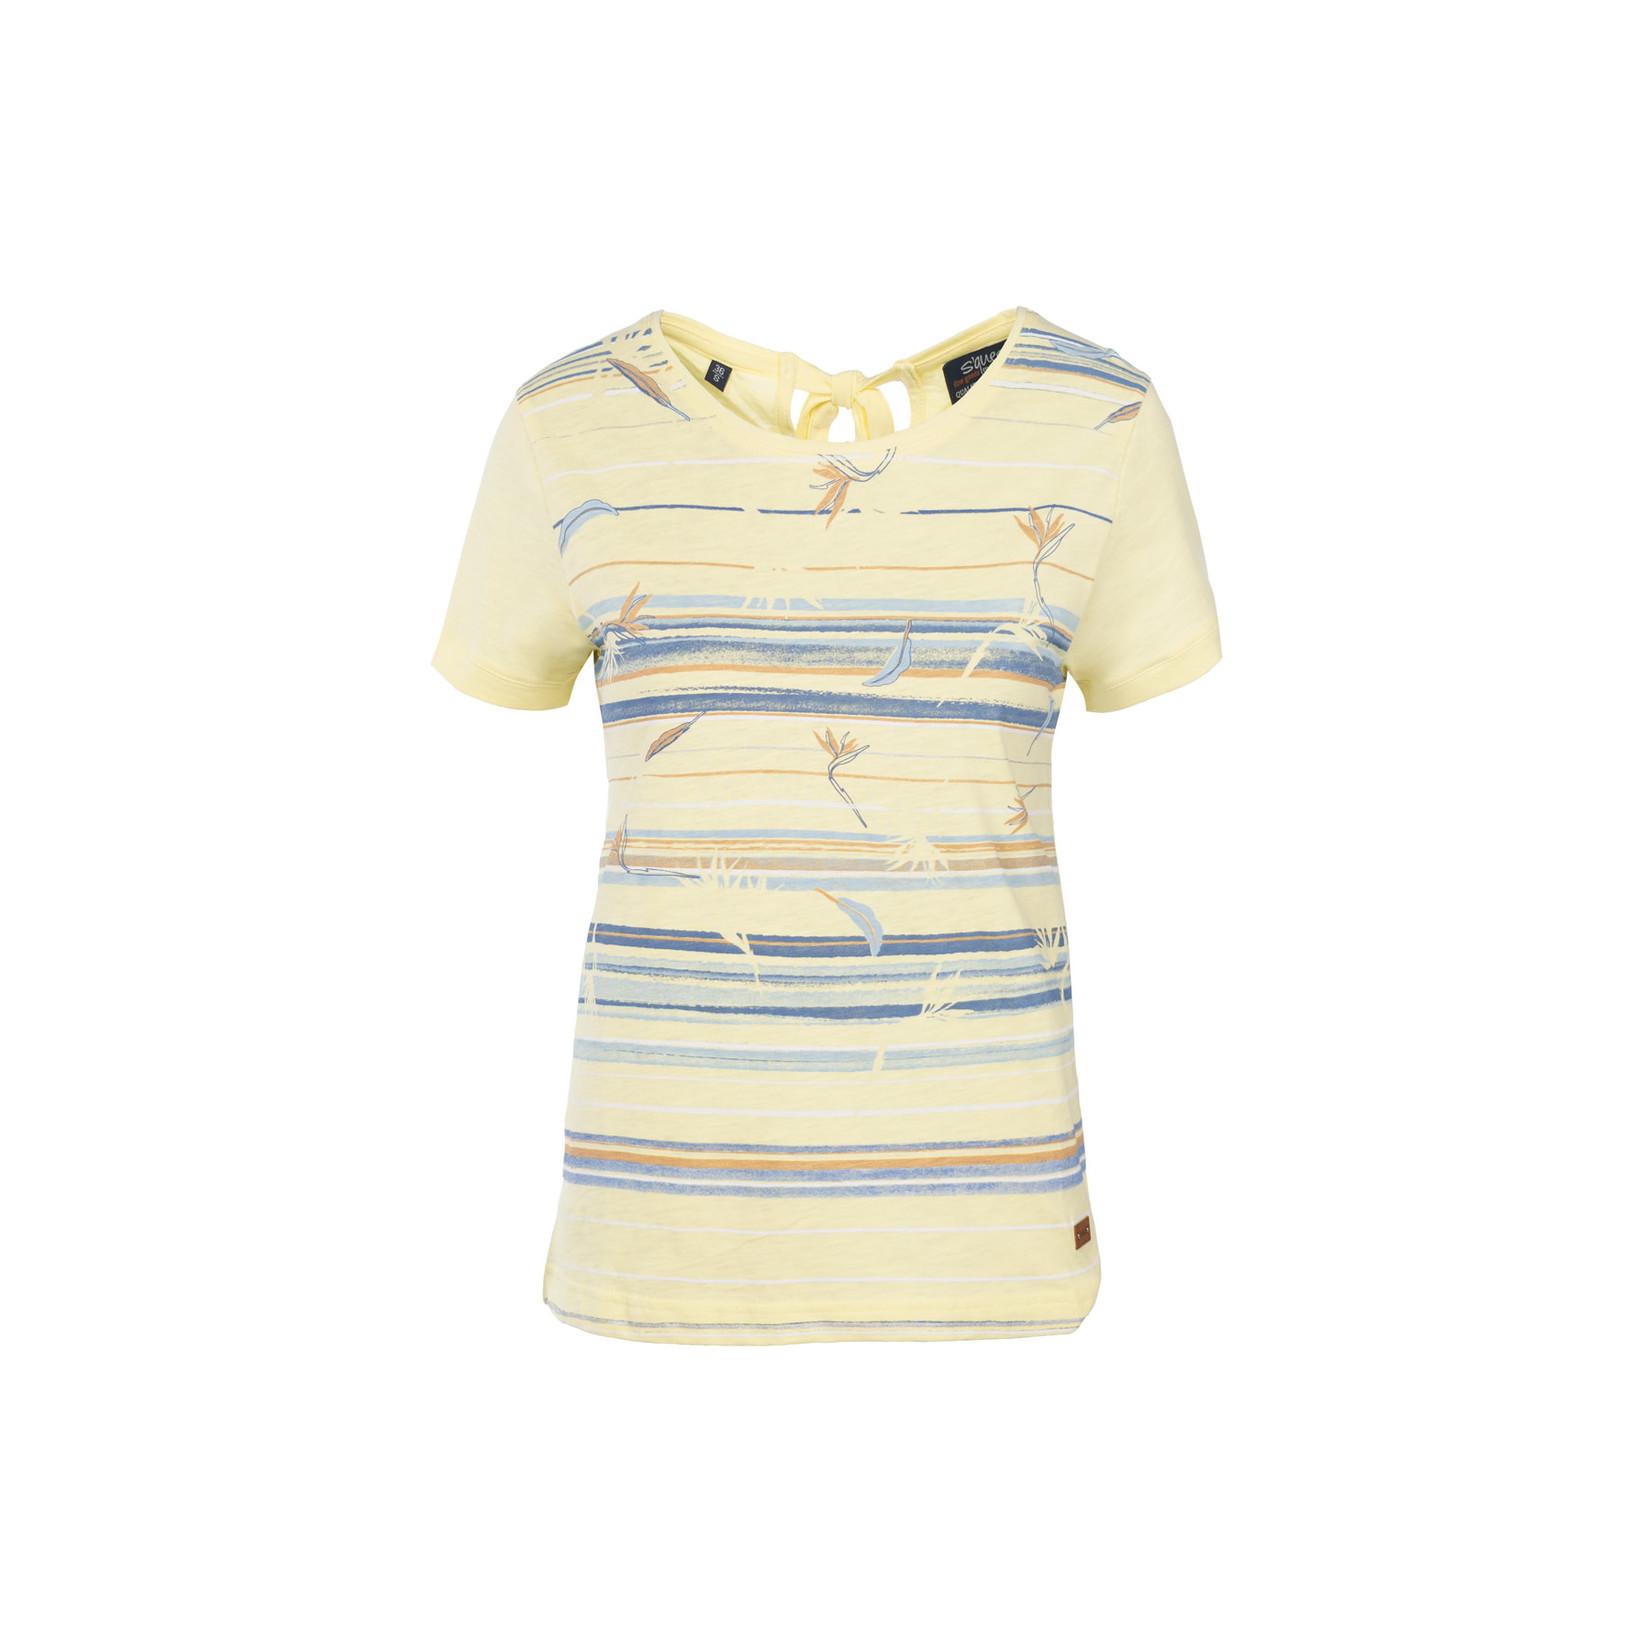 Soquesto Soquesto Shirt ½ 6180-501814 stripe yellow